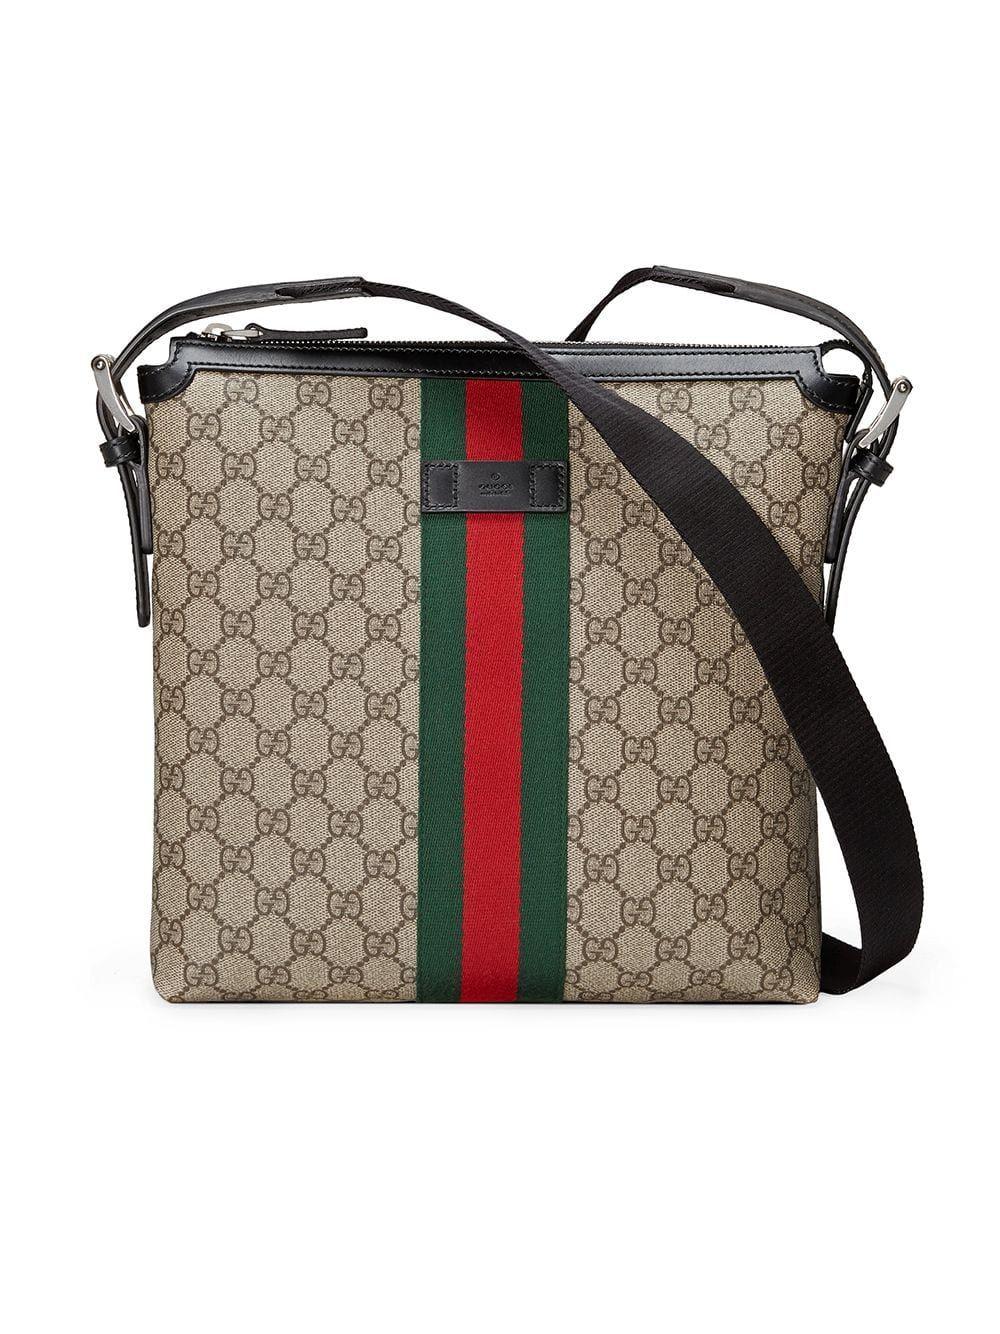 d7f6fb4f Gucci Web GG Supreme messenger - Brown | Products in 2019 | Gucci ...